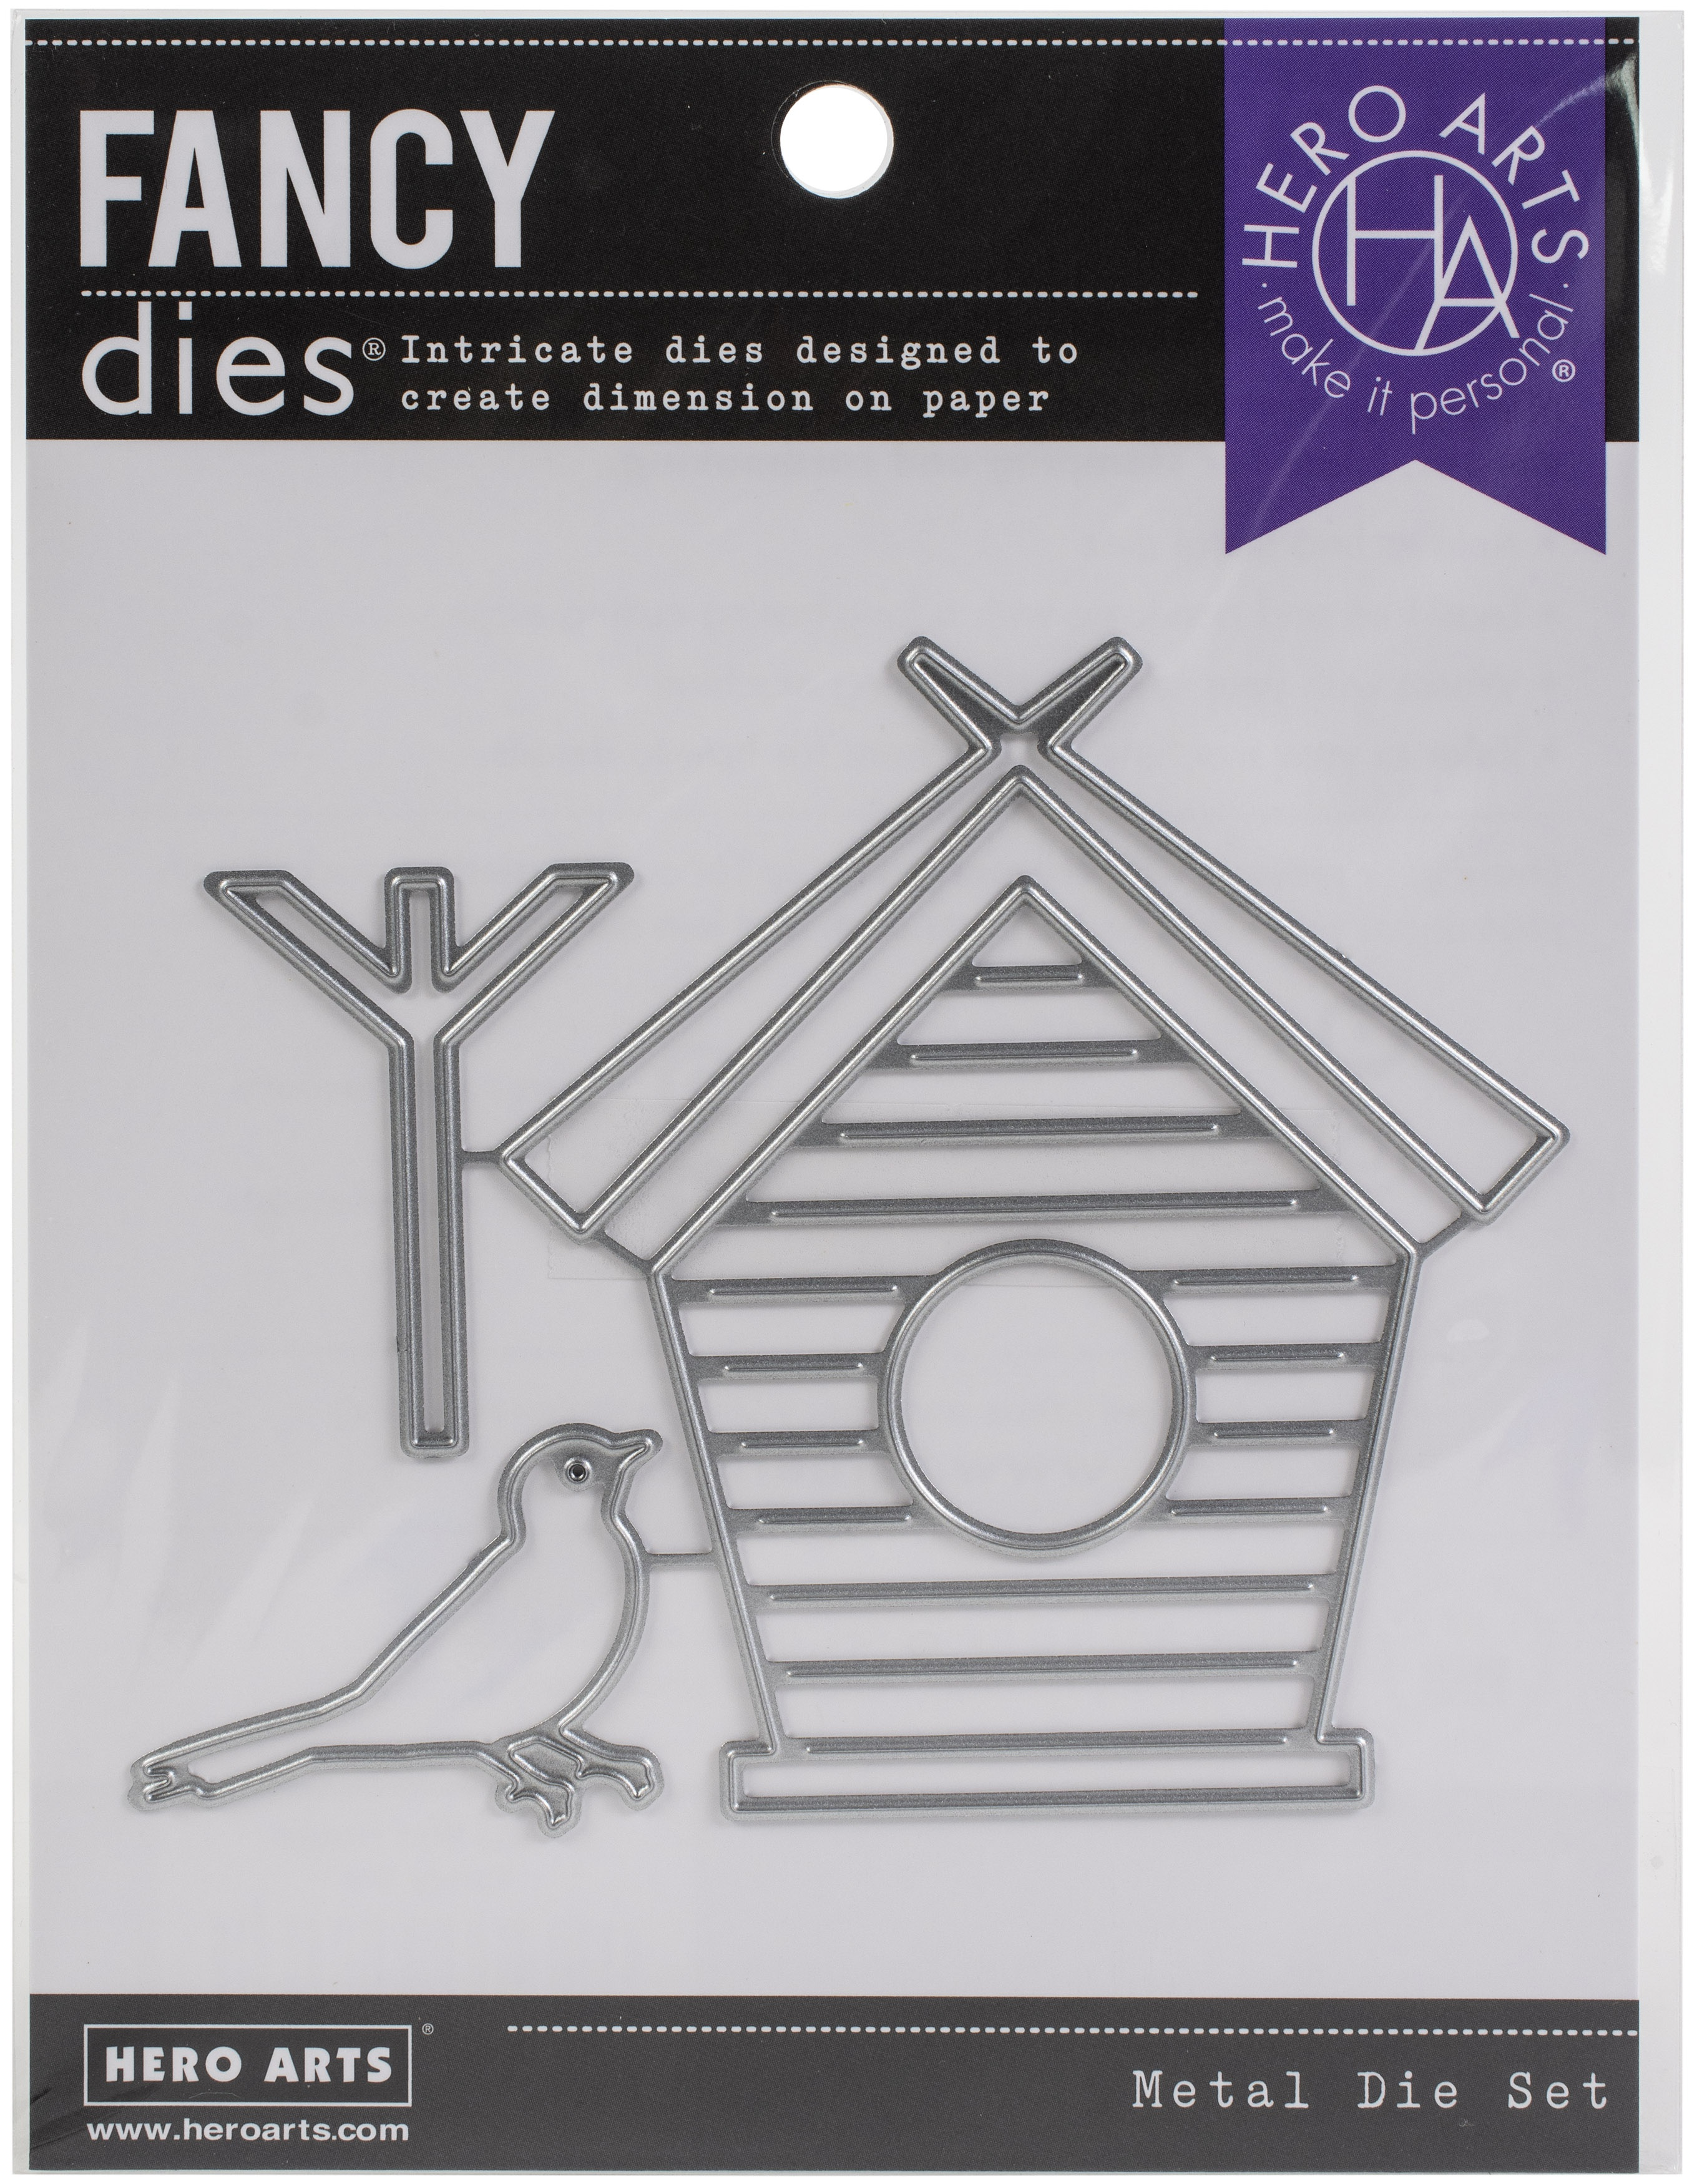 Hero Arts Fancy Dies - Bird House